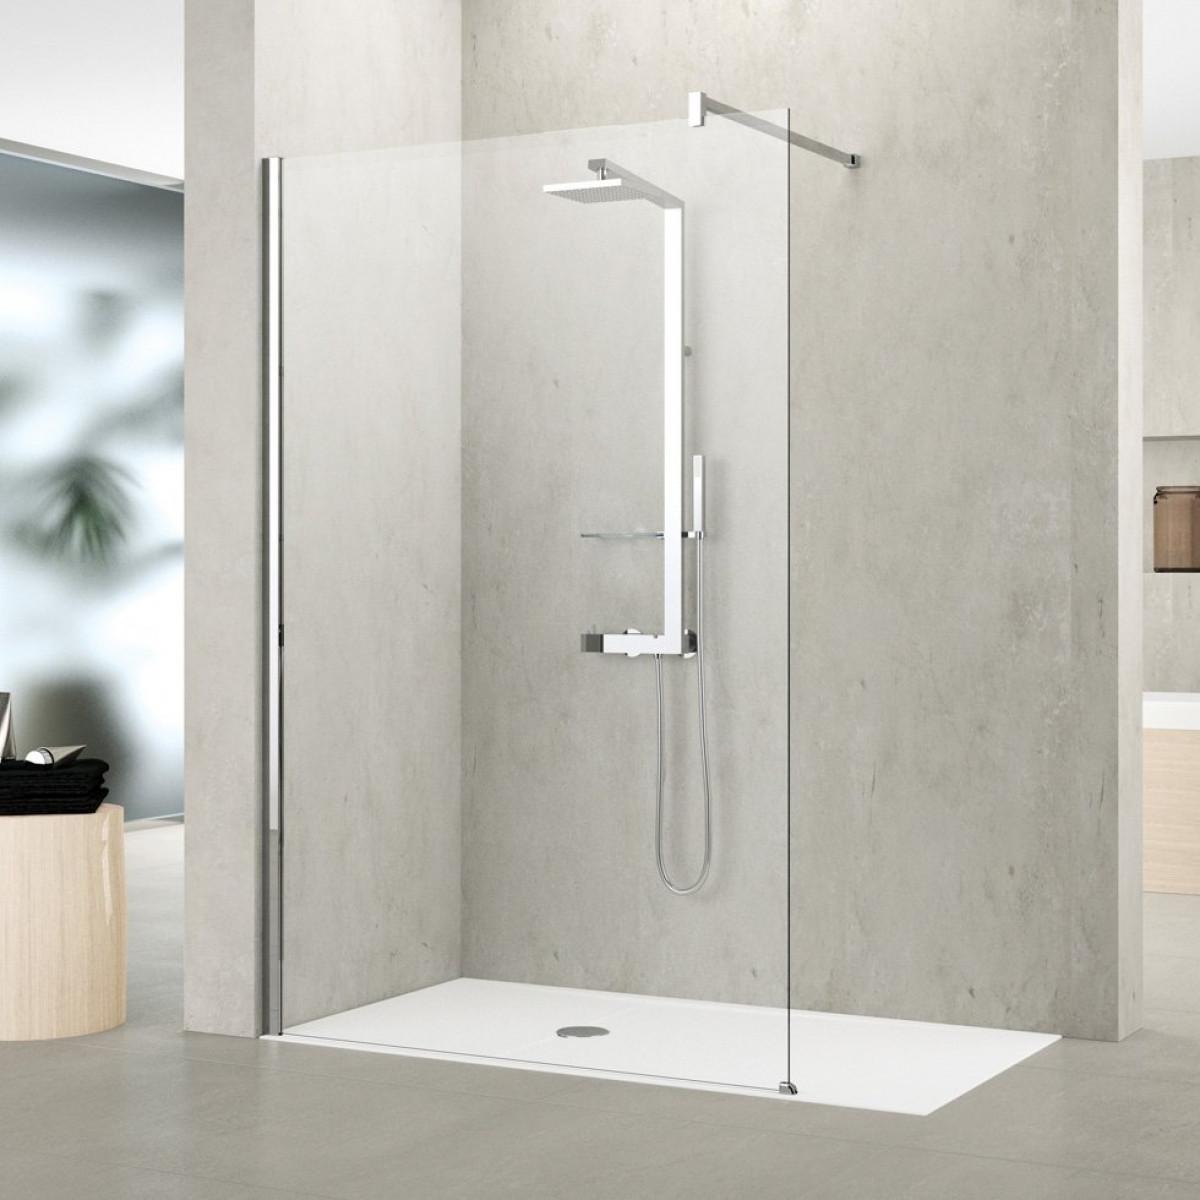 Novellini Shower Panel Kuadra H 1000mm Kuadh100